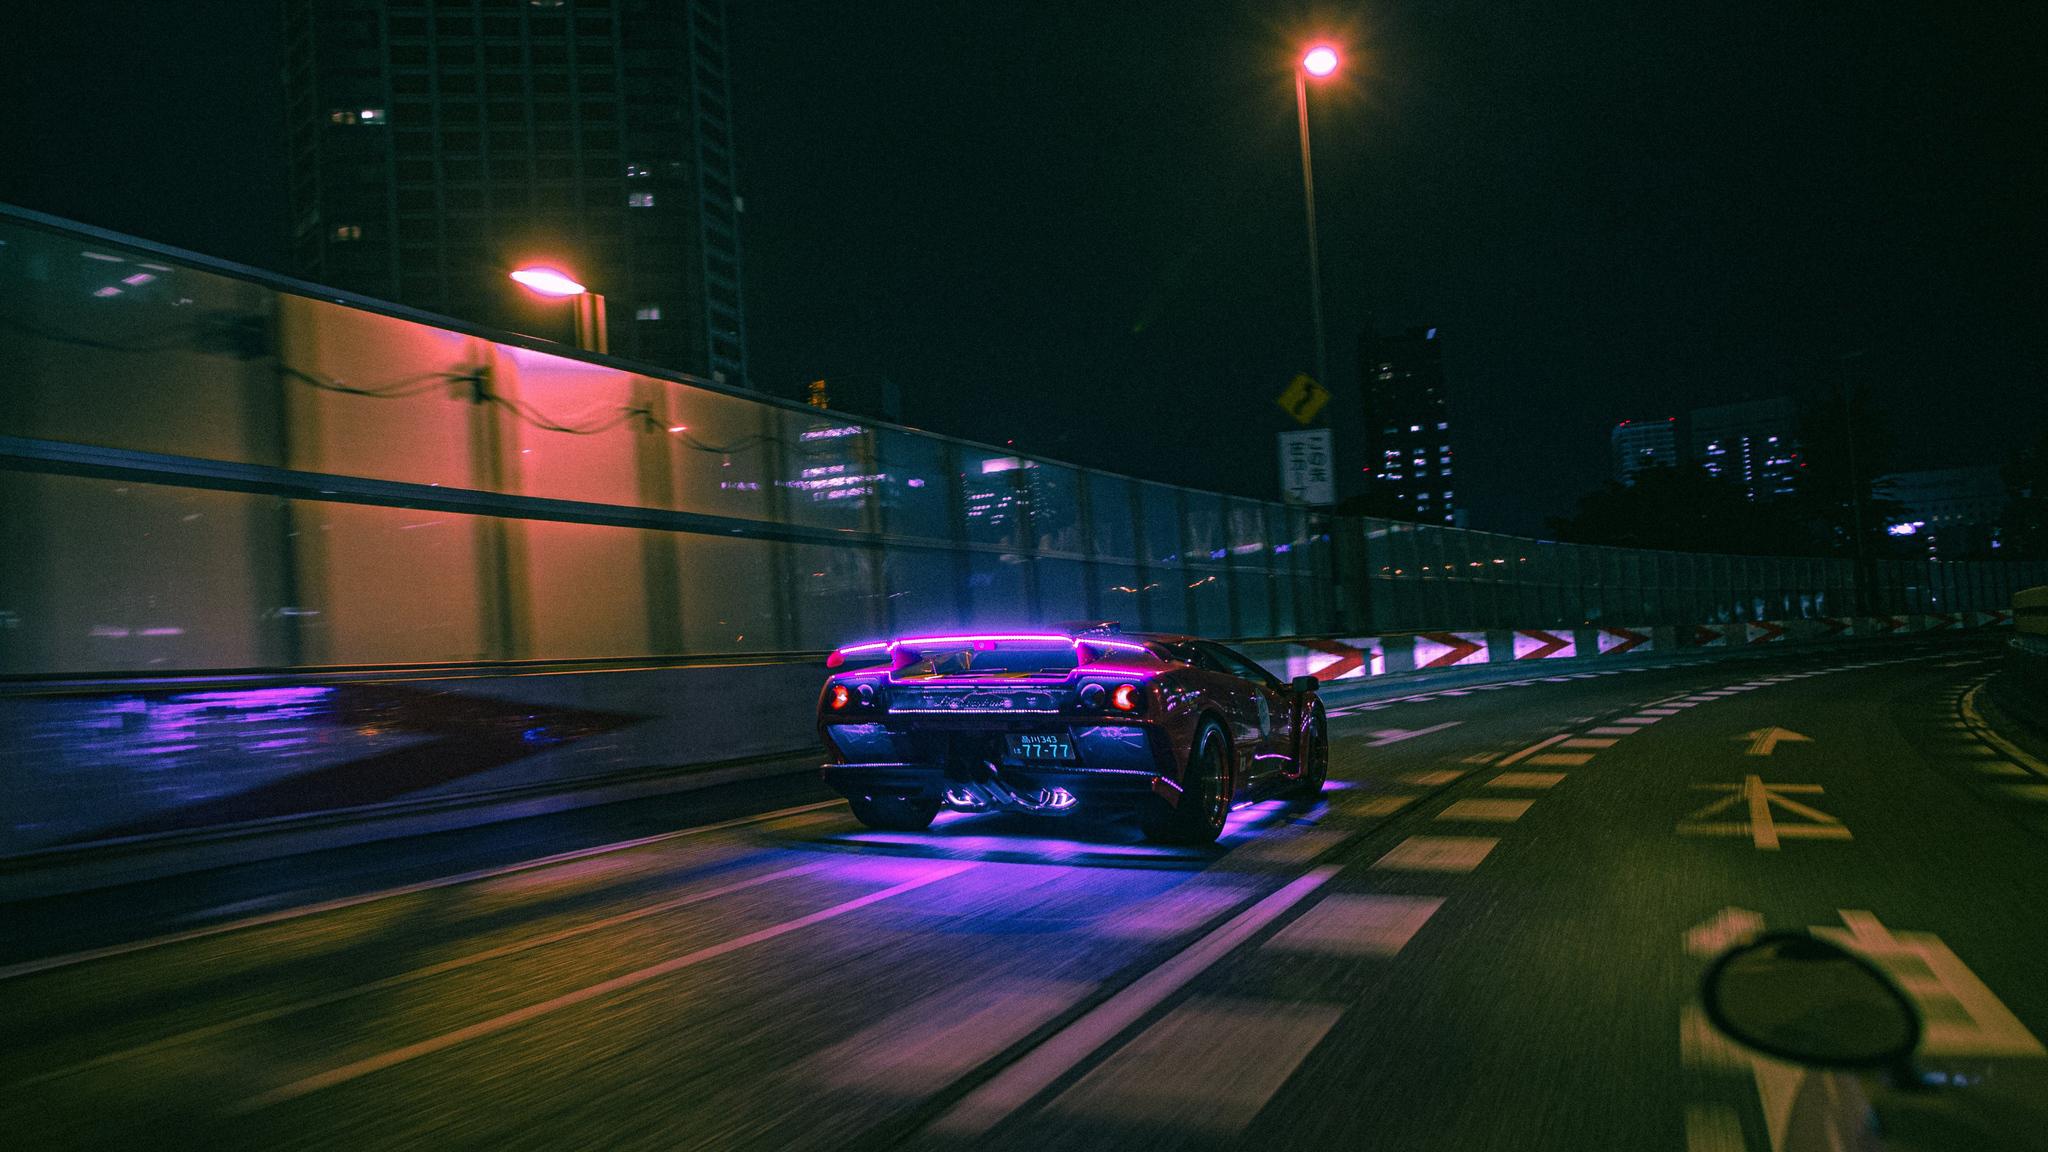 2048x1152 Lamborghini Neon Lights On Road 4k 2048x1152 ...